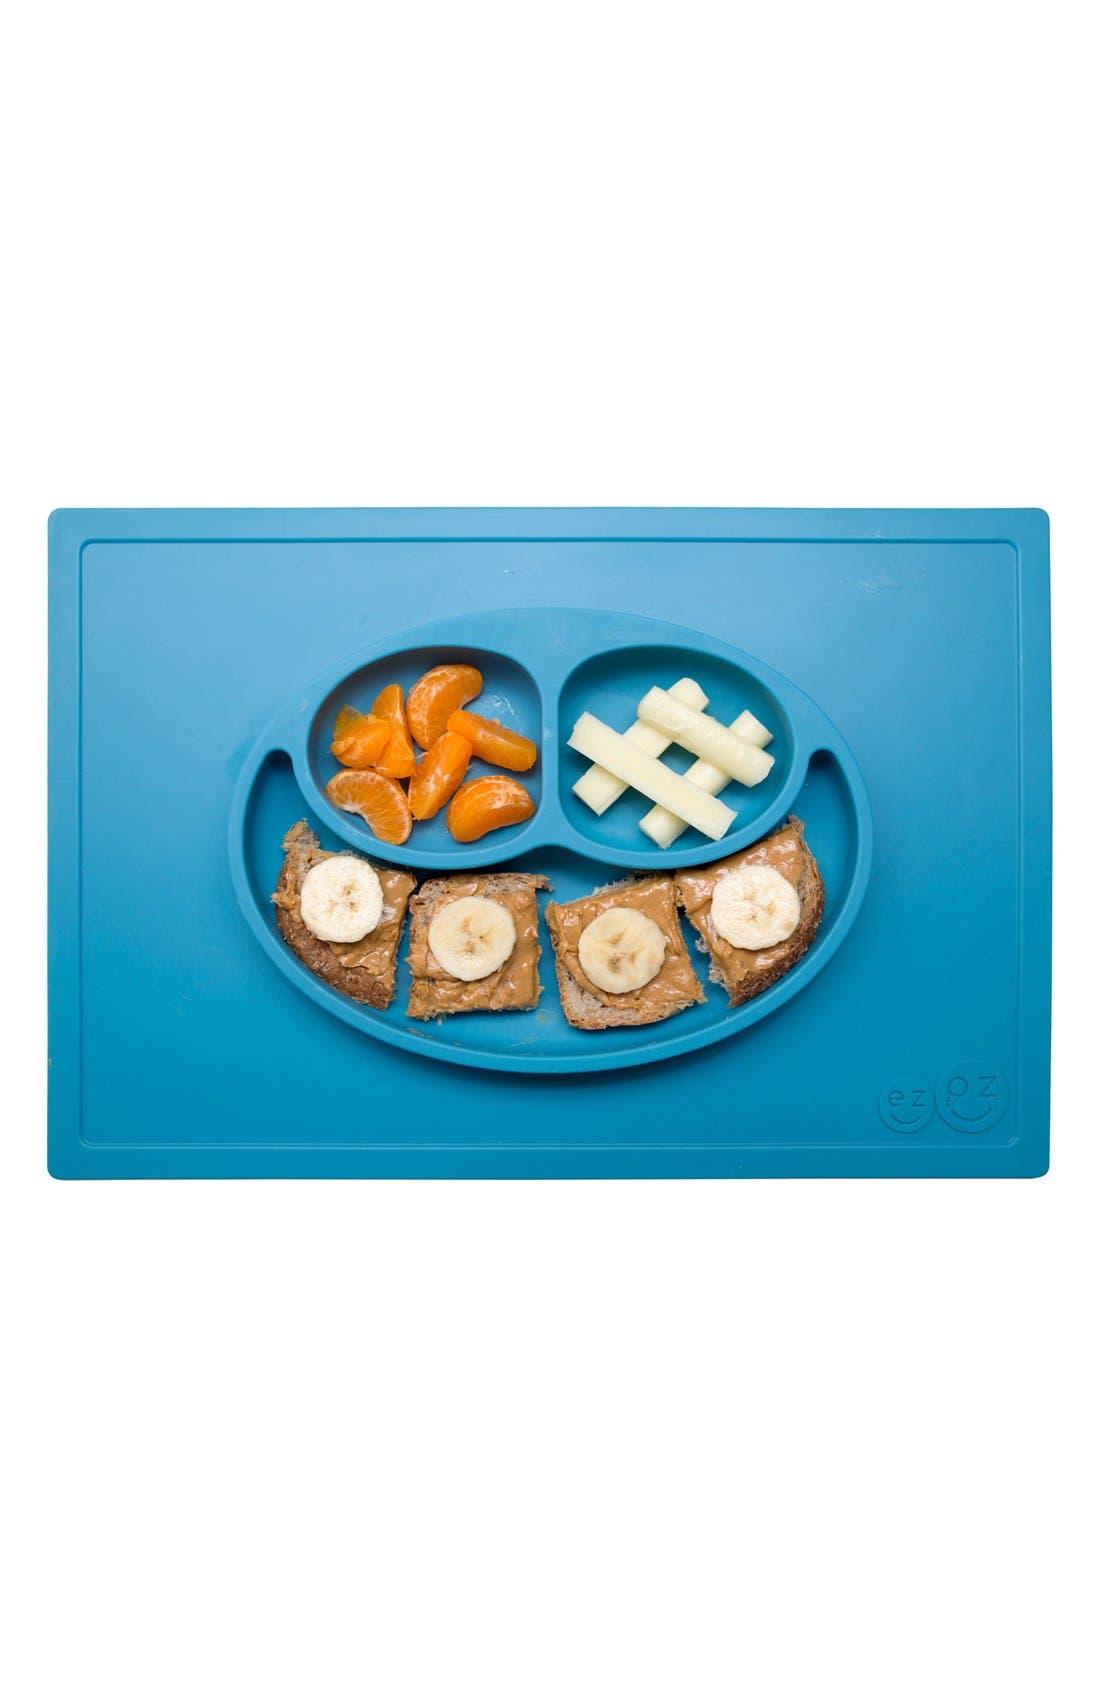 'Happy Mat' Silicone Feeding Mat,                             Alternate thumbnail 4, color,                             Blue